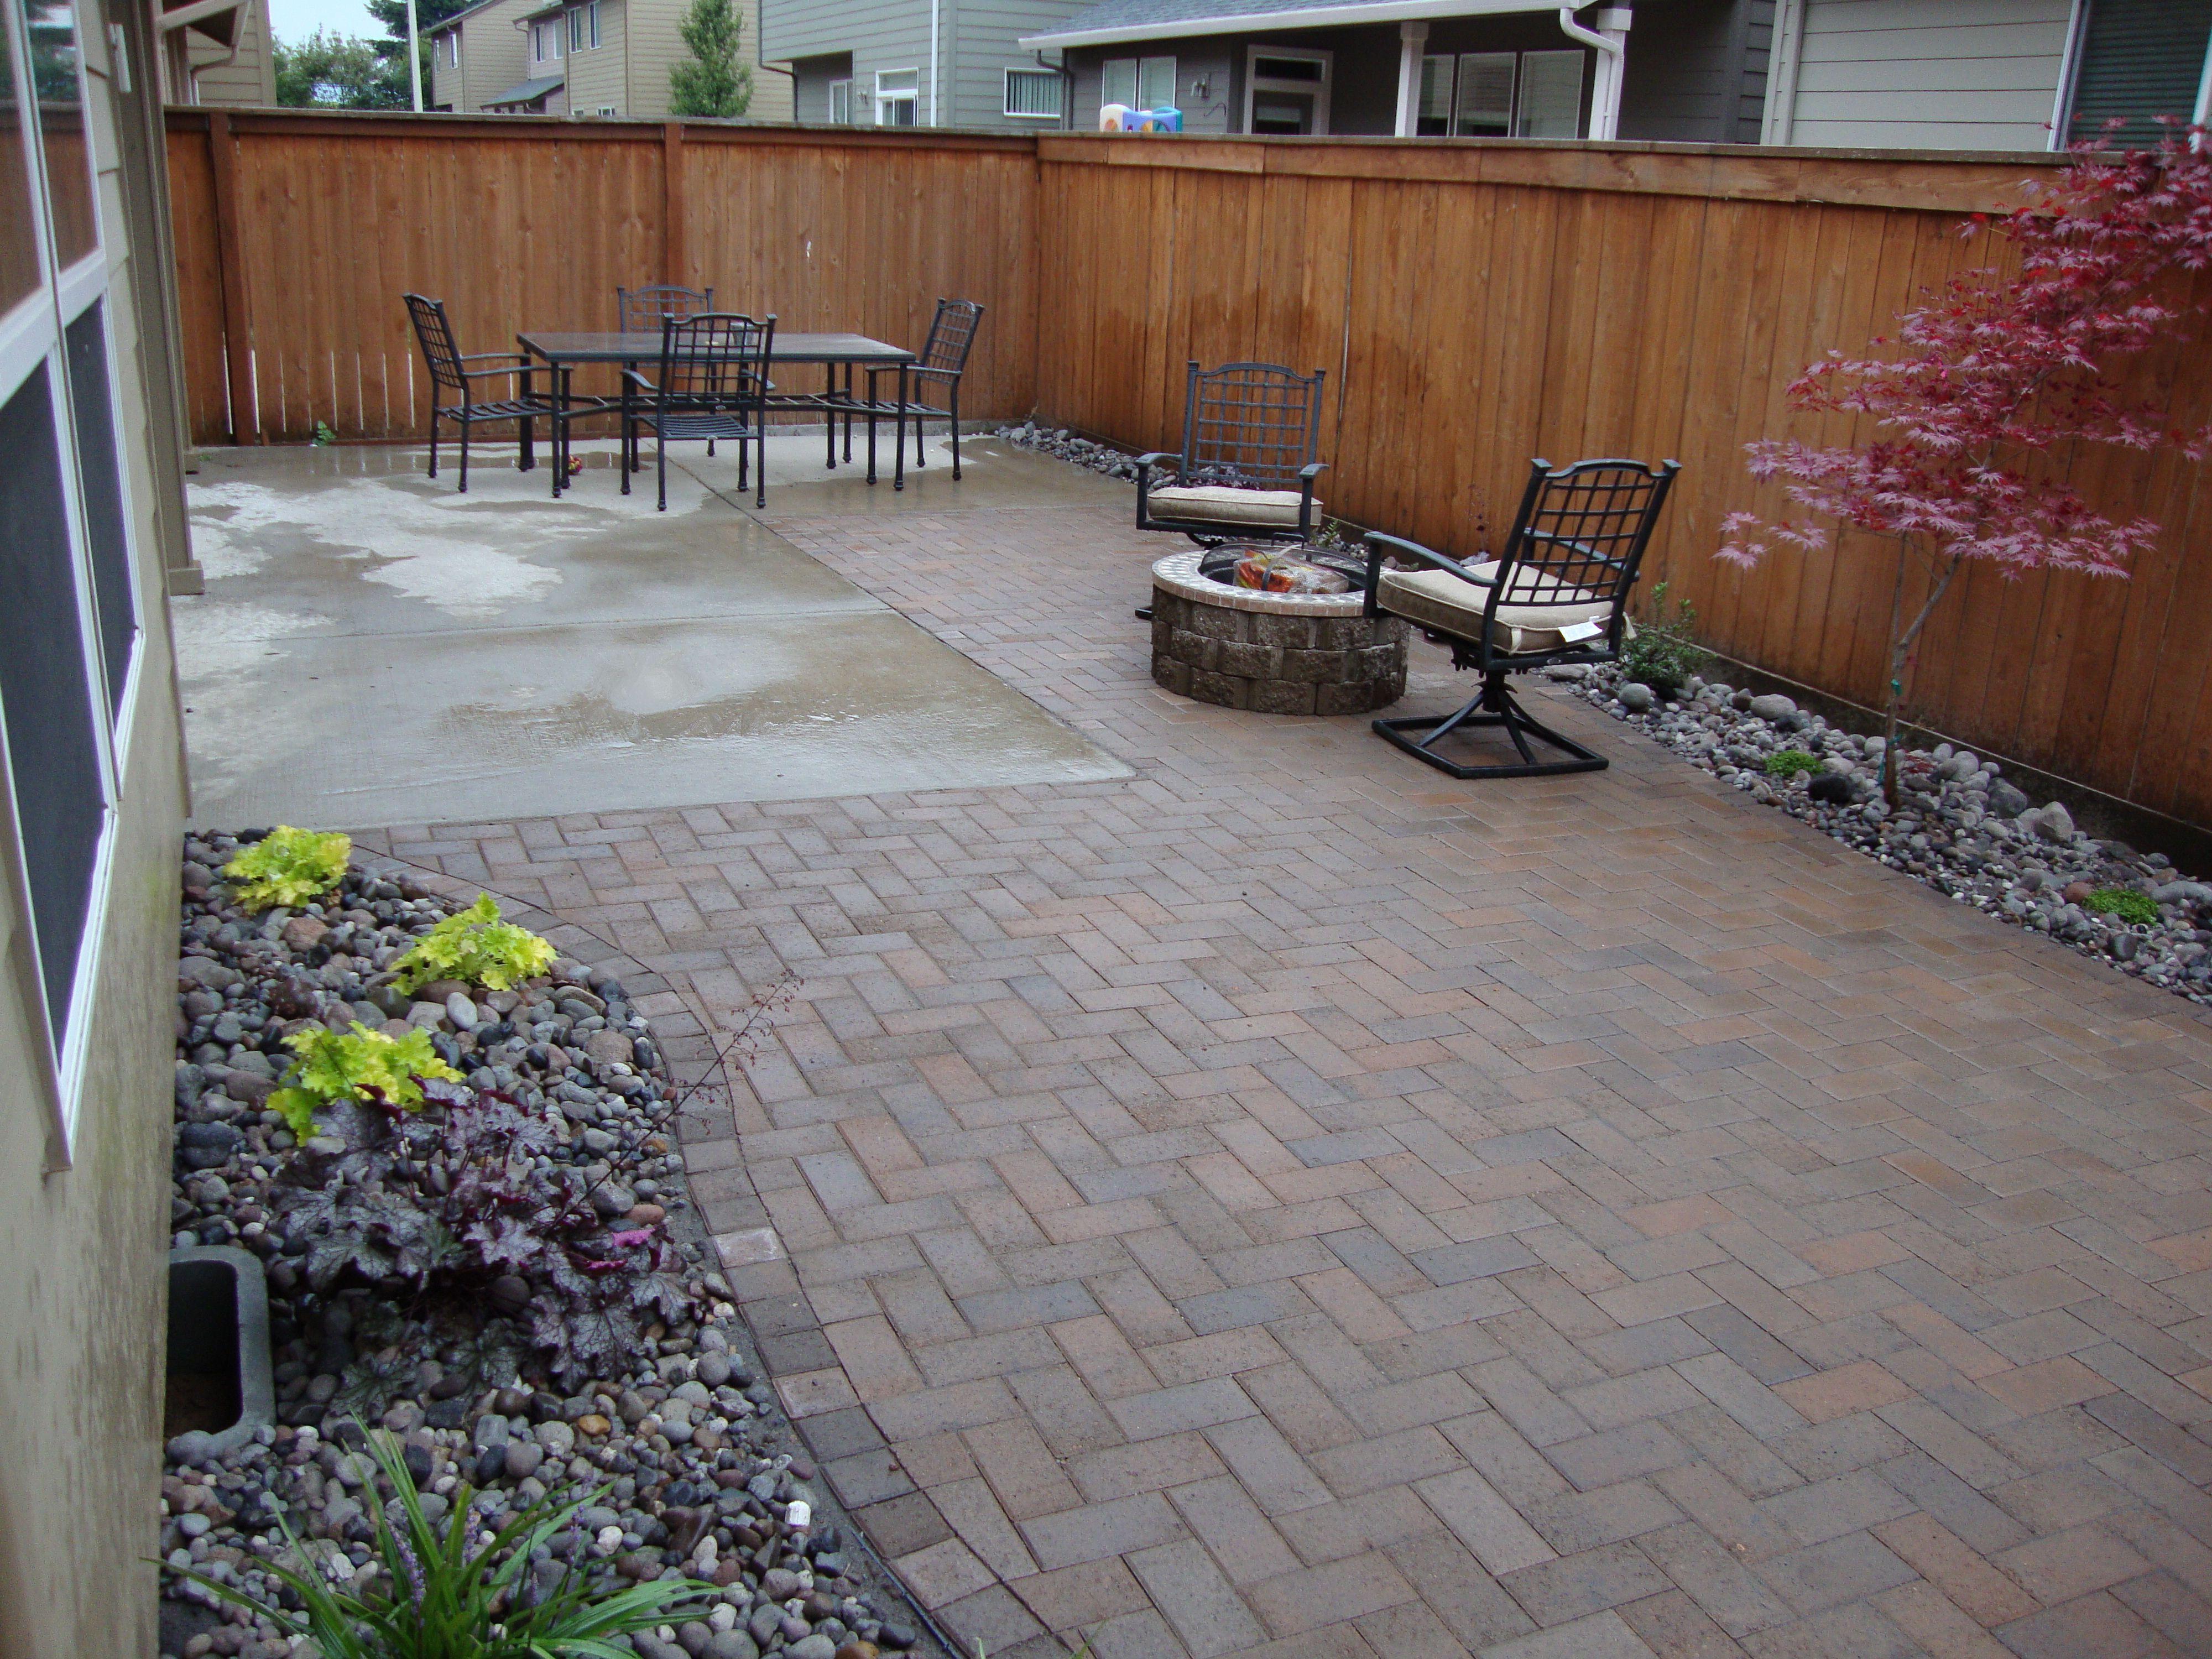 Small backyard pavers & planter   Patio ideas   Pinterest ...